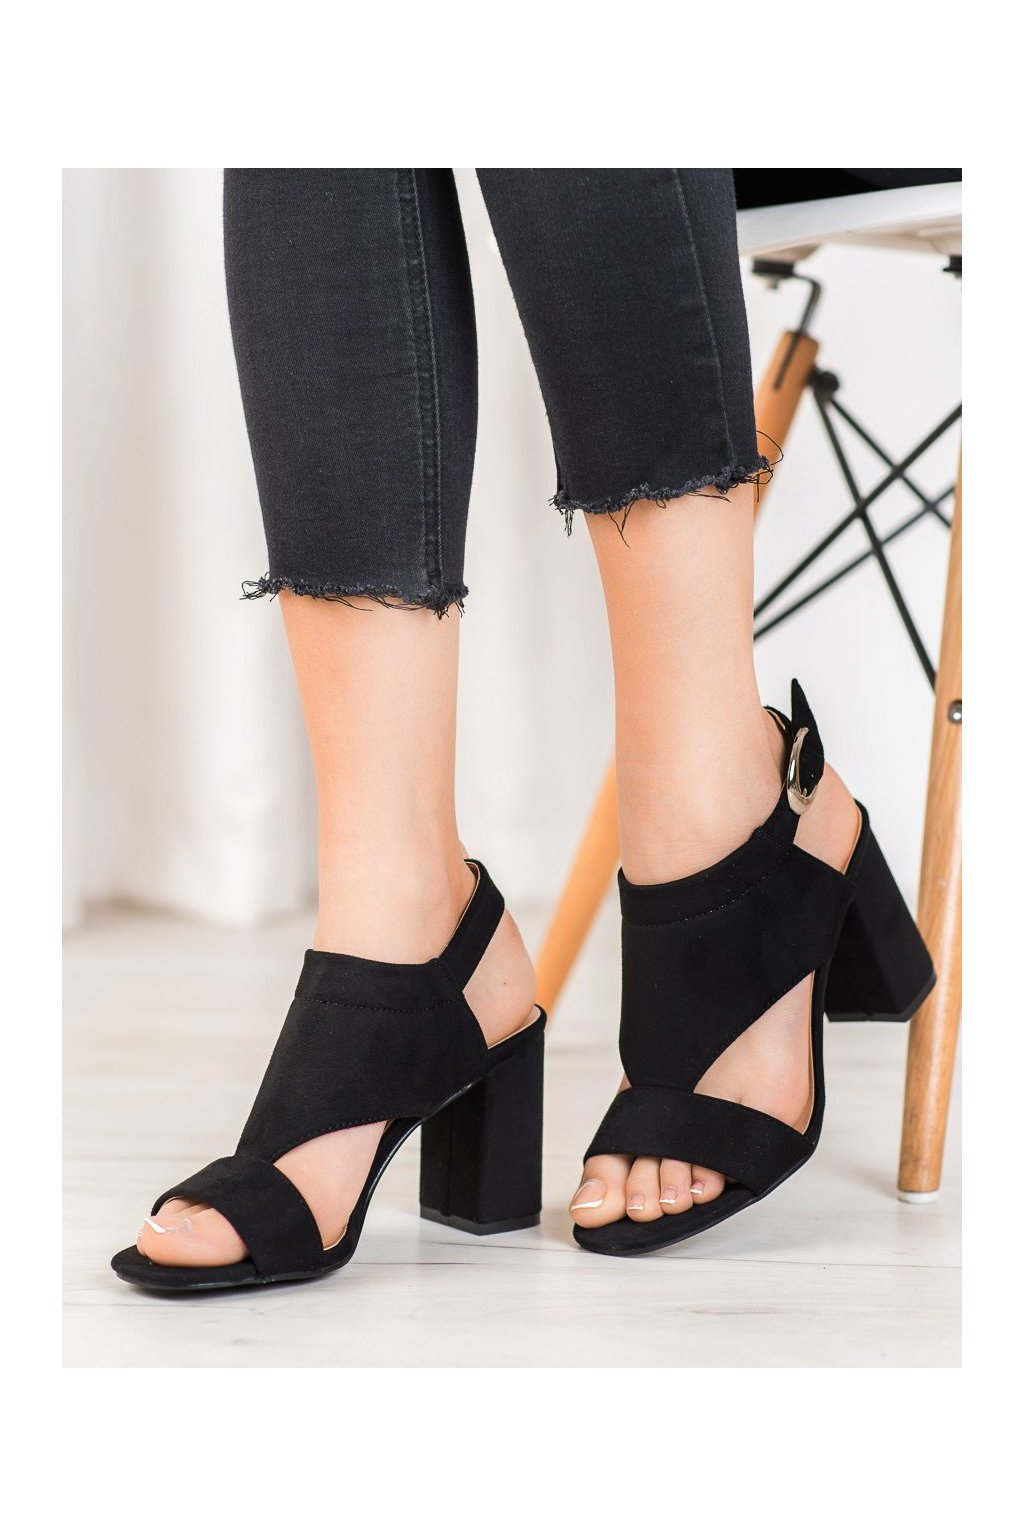 Čierne sandále Vinceza kod YQE20-17053B